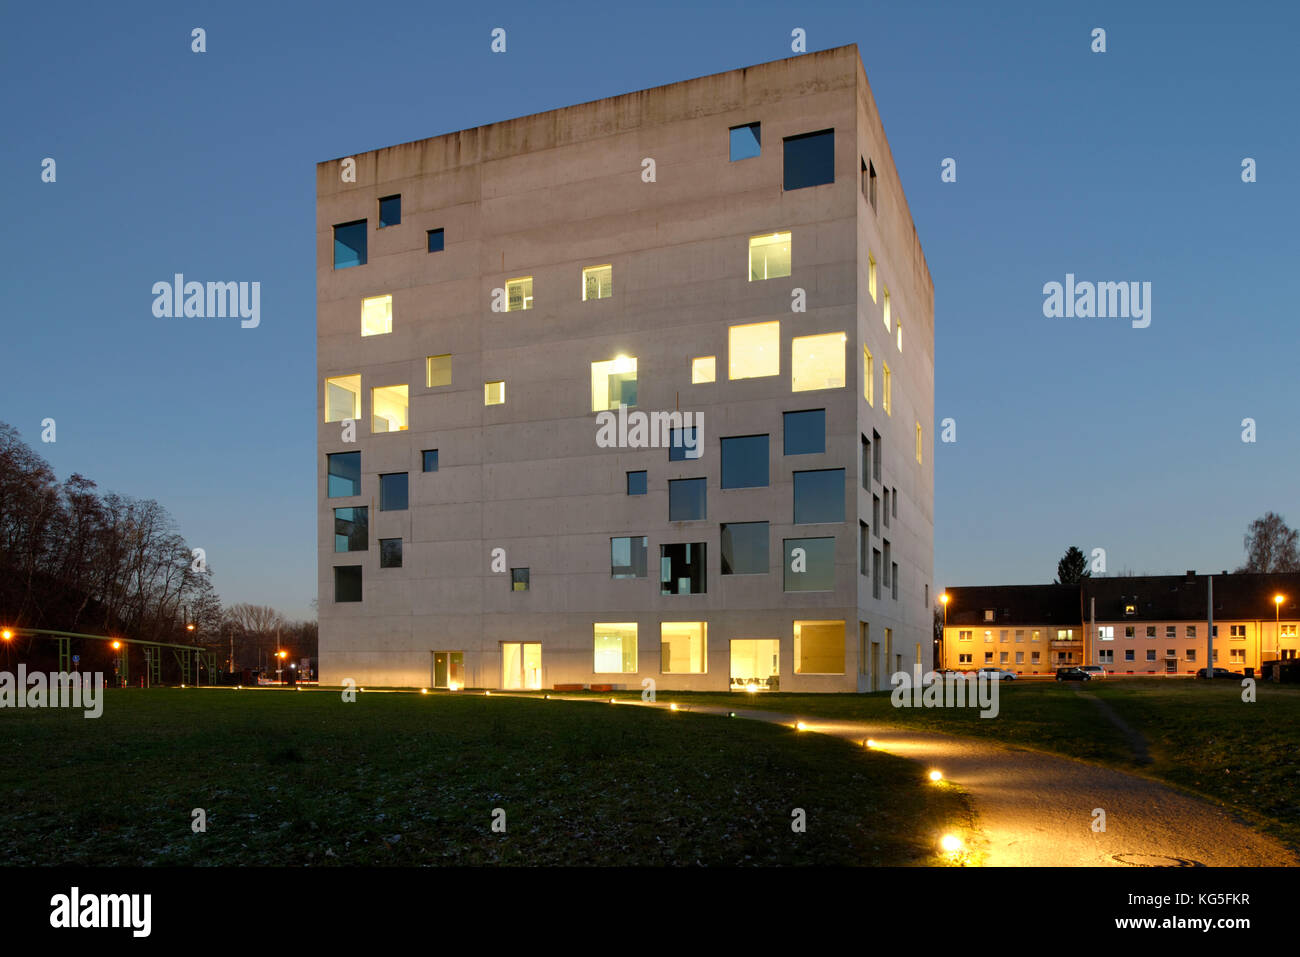 Folkwang Universität der Künste, SANAA-building in the evening light, Zollverein Coal Mine Industrial - Stock Image